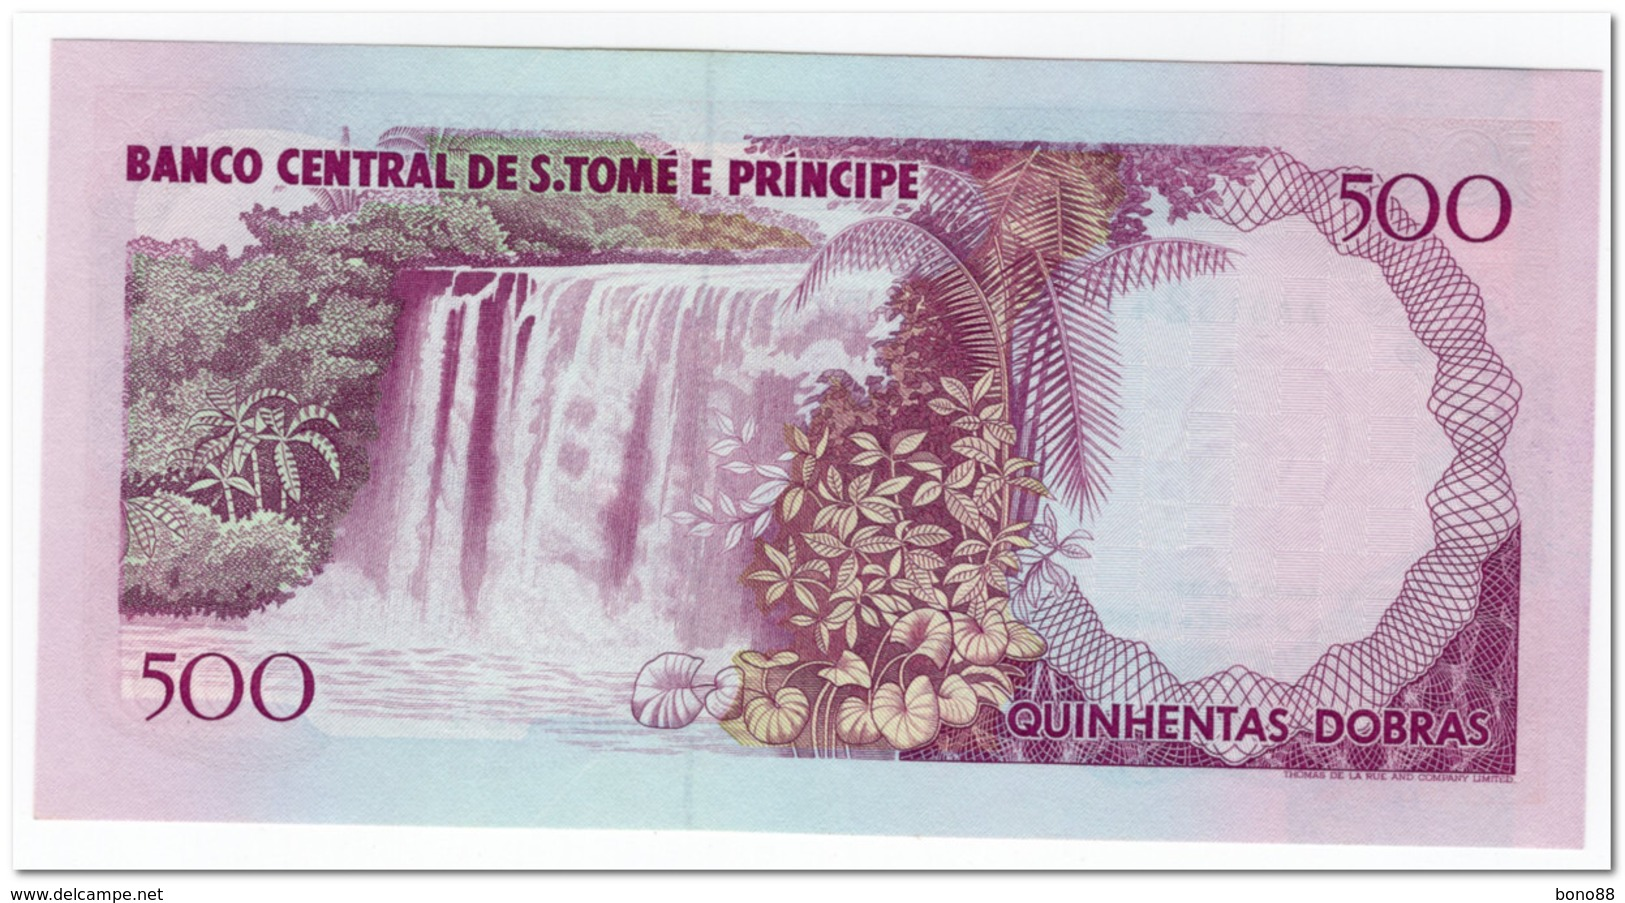 SAINT THOMAS & PRINCE,500 DOBRAS,1993,P.63,UNC - Sao Tome And Principe